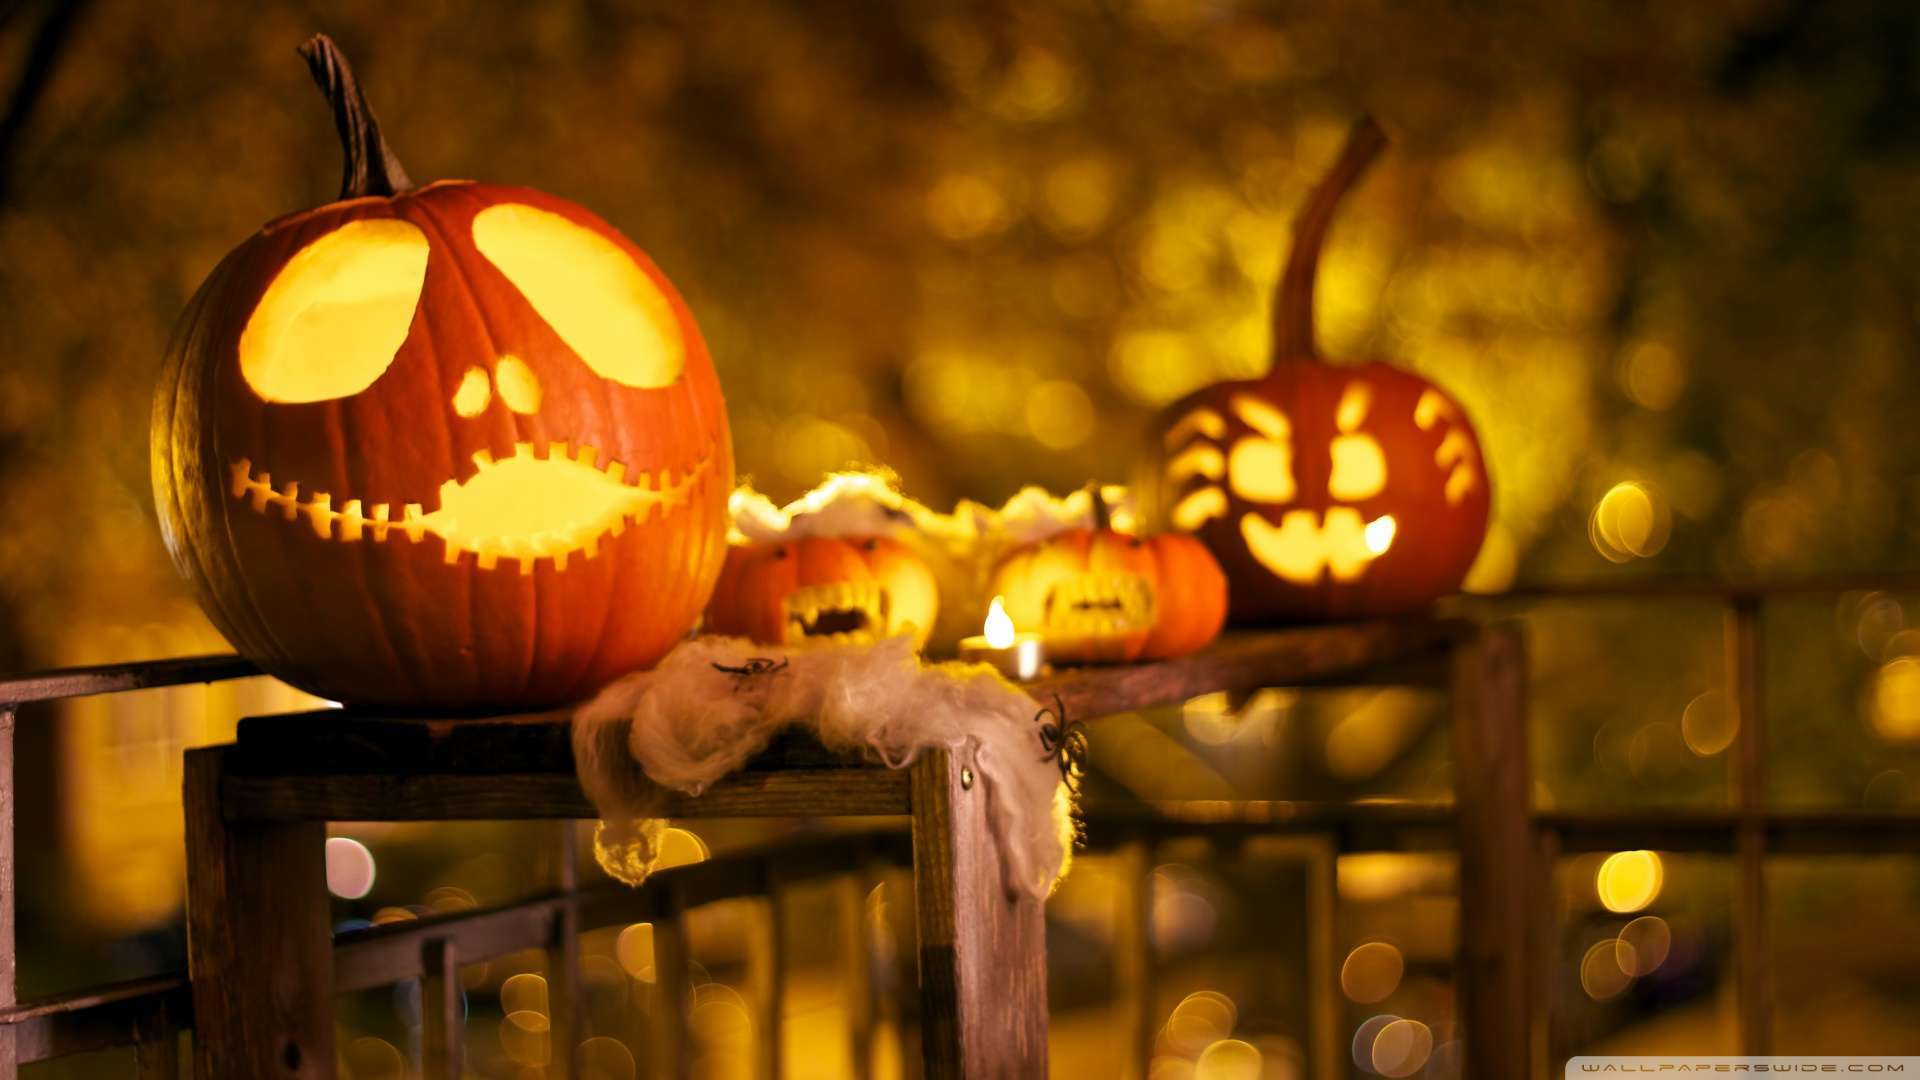 halloween decorations hd wallpaper - photo #2